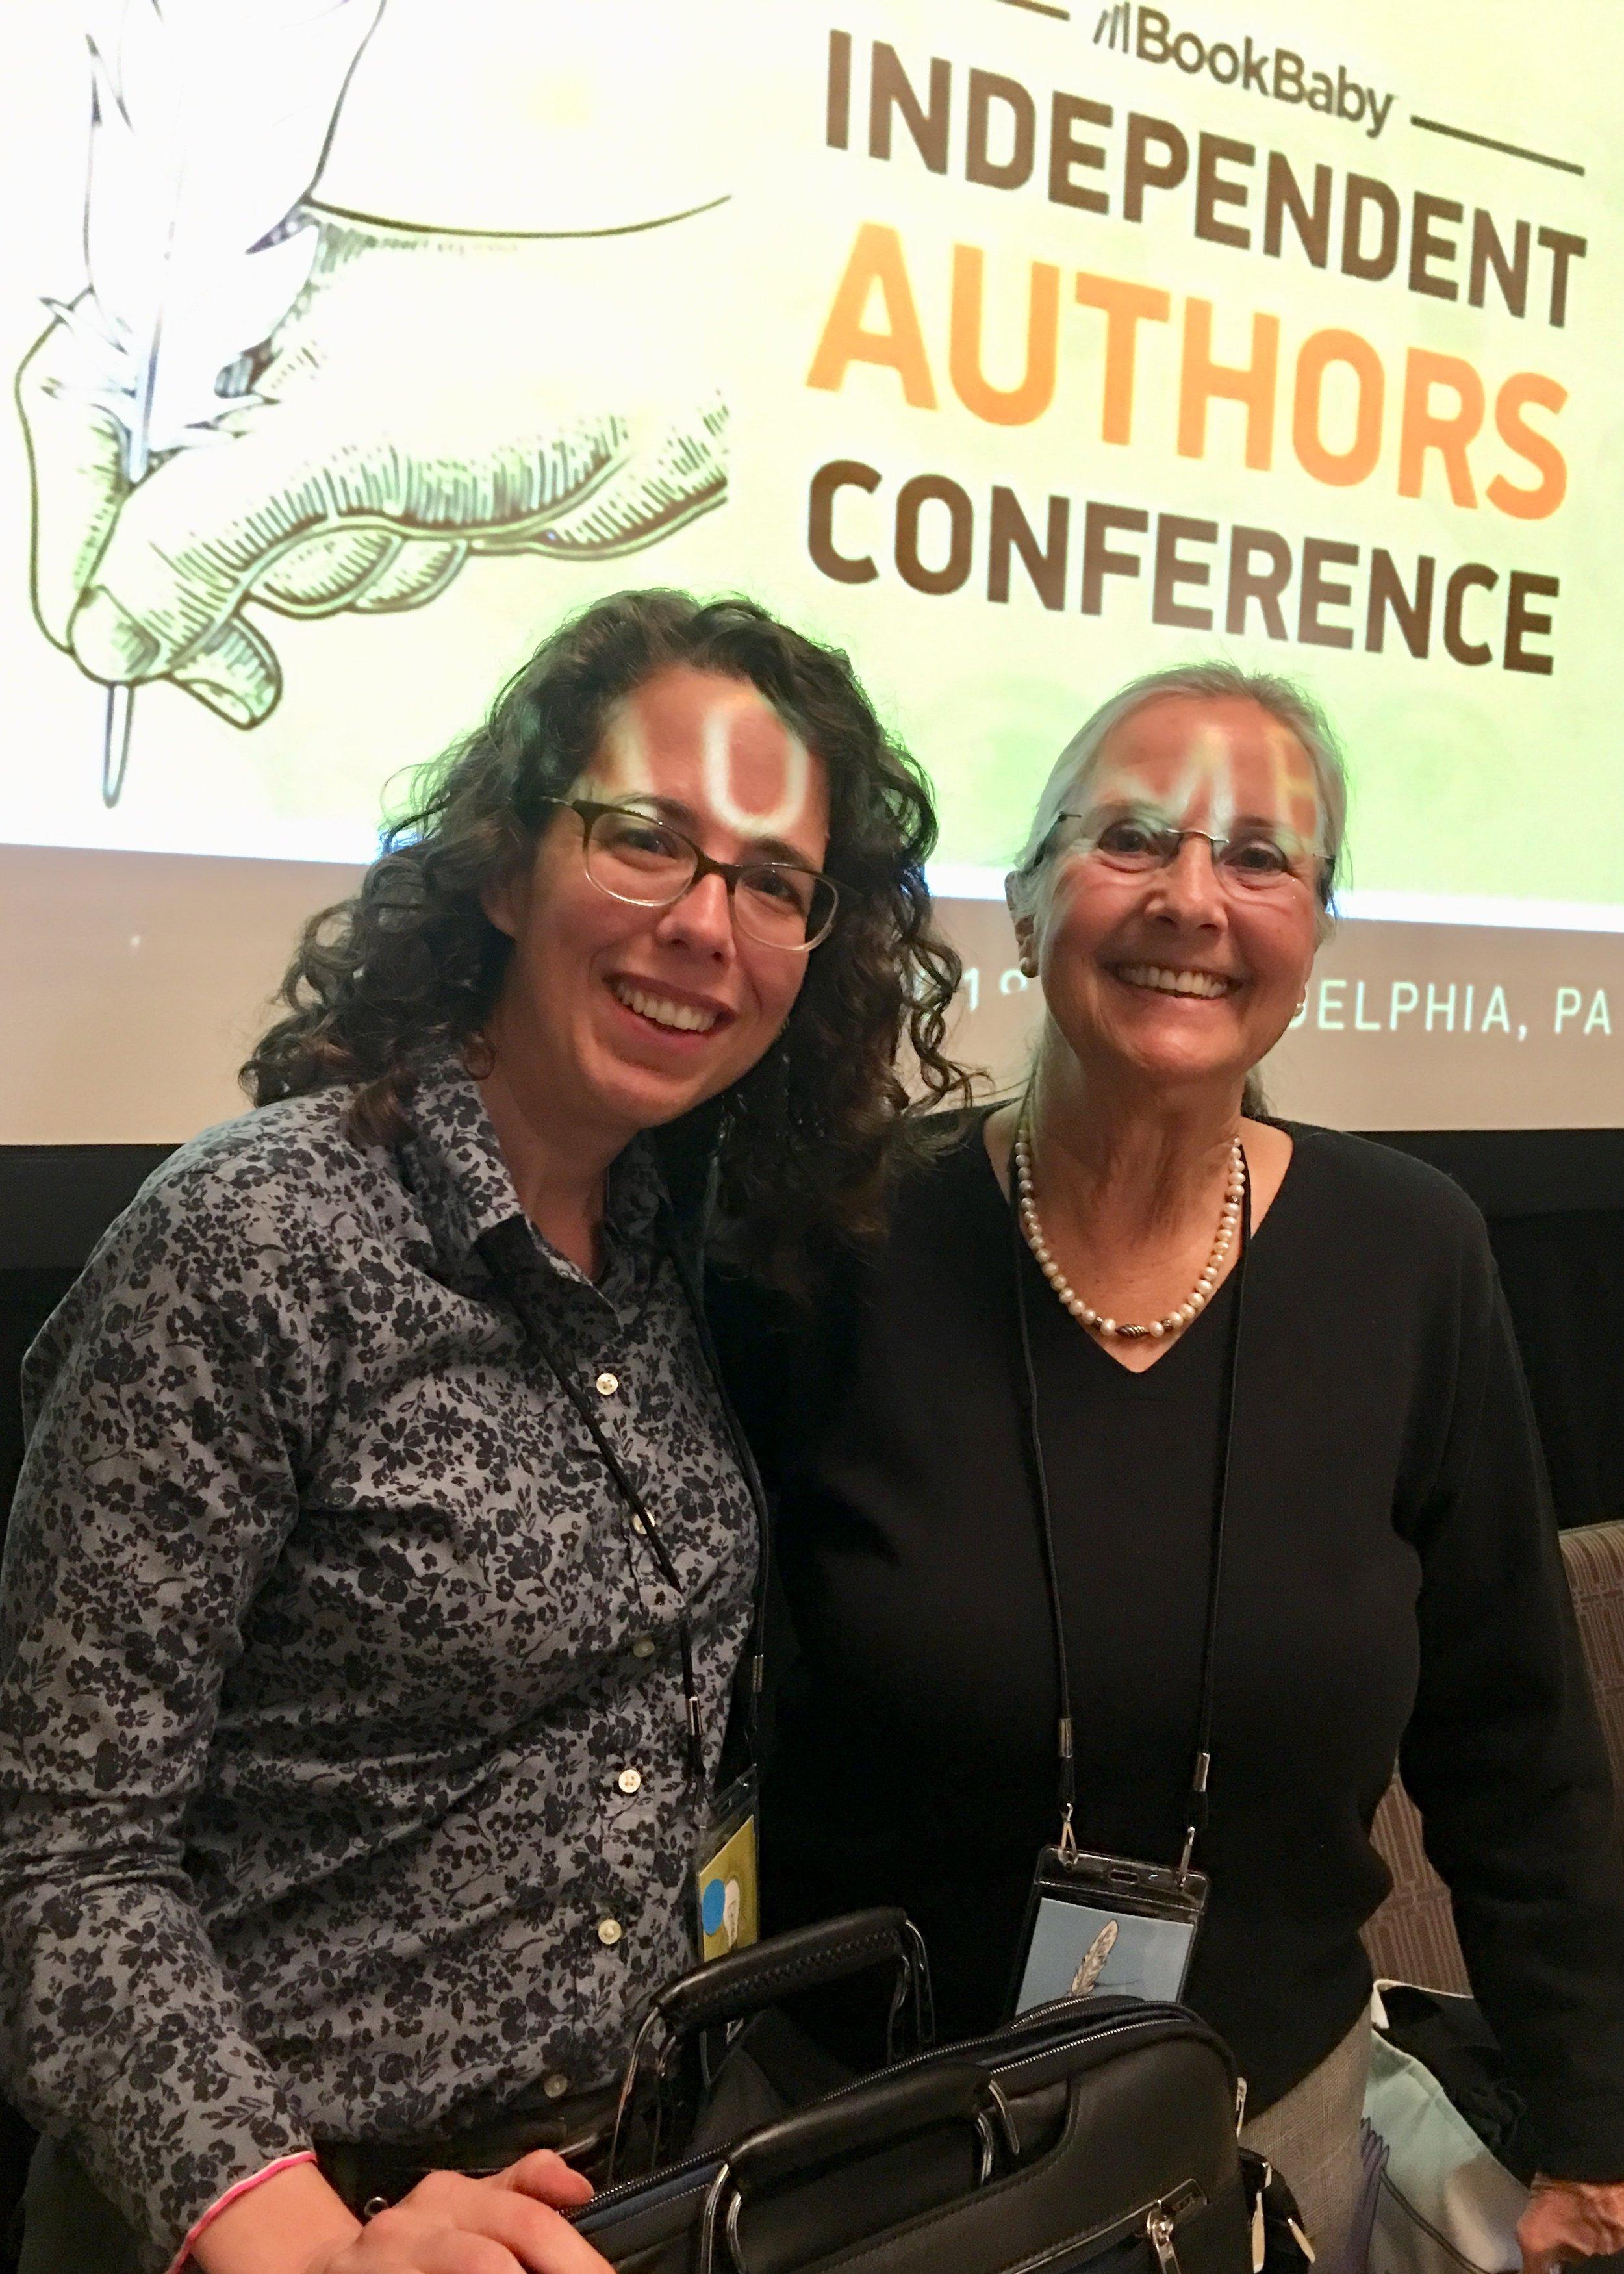 Professor Jane Friedman, self publishing and independent author guru!